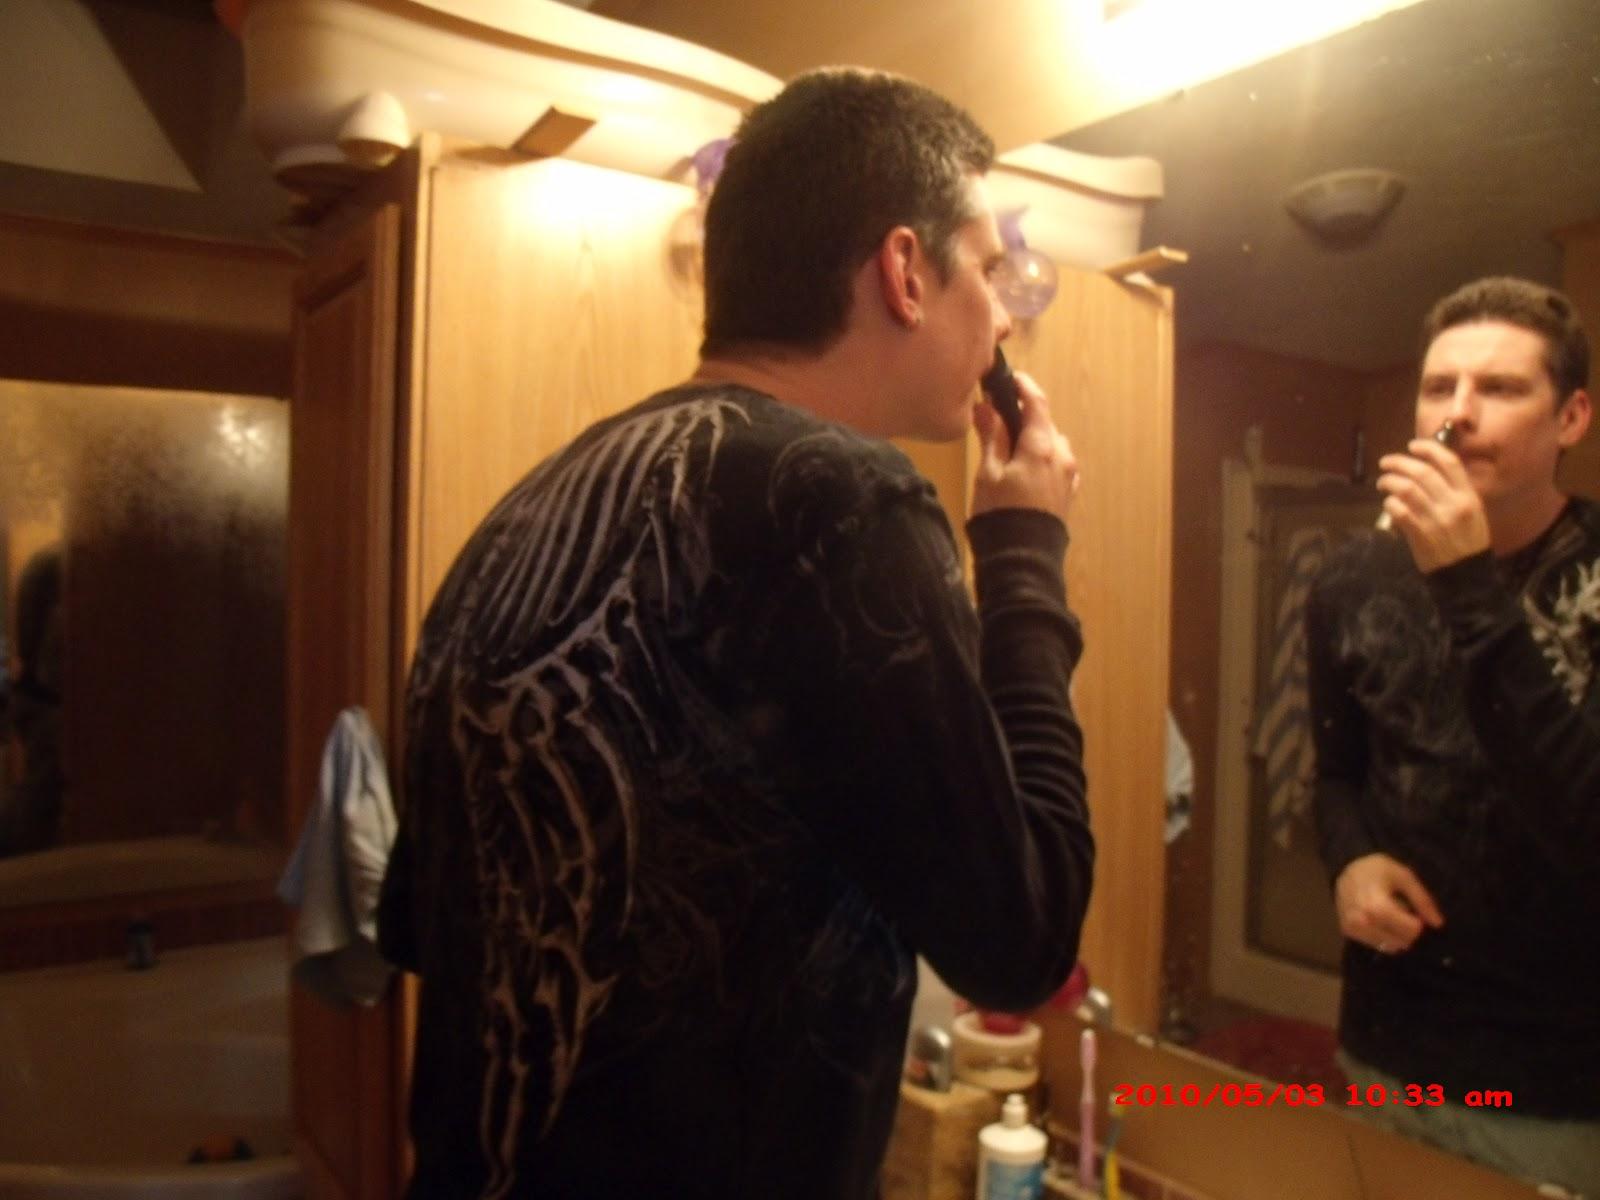 Men grooming privates apexwallpapers com